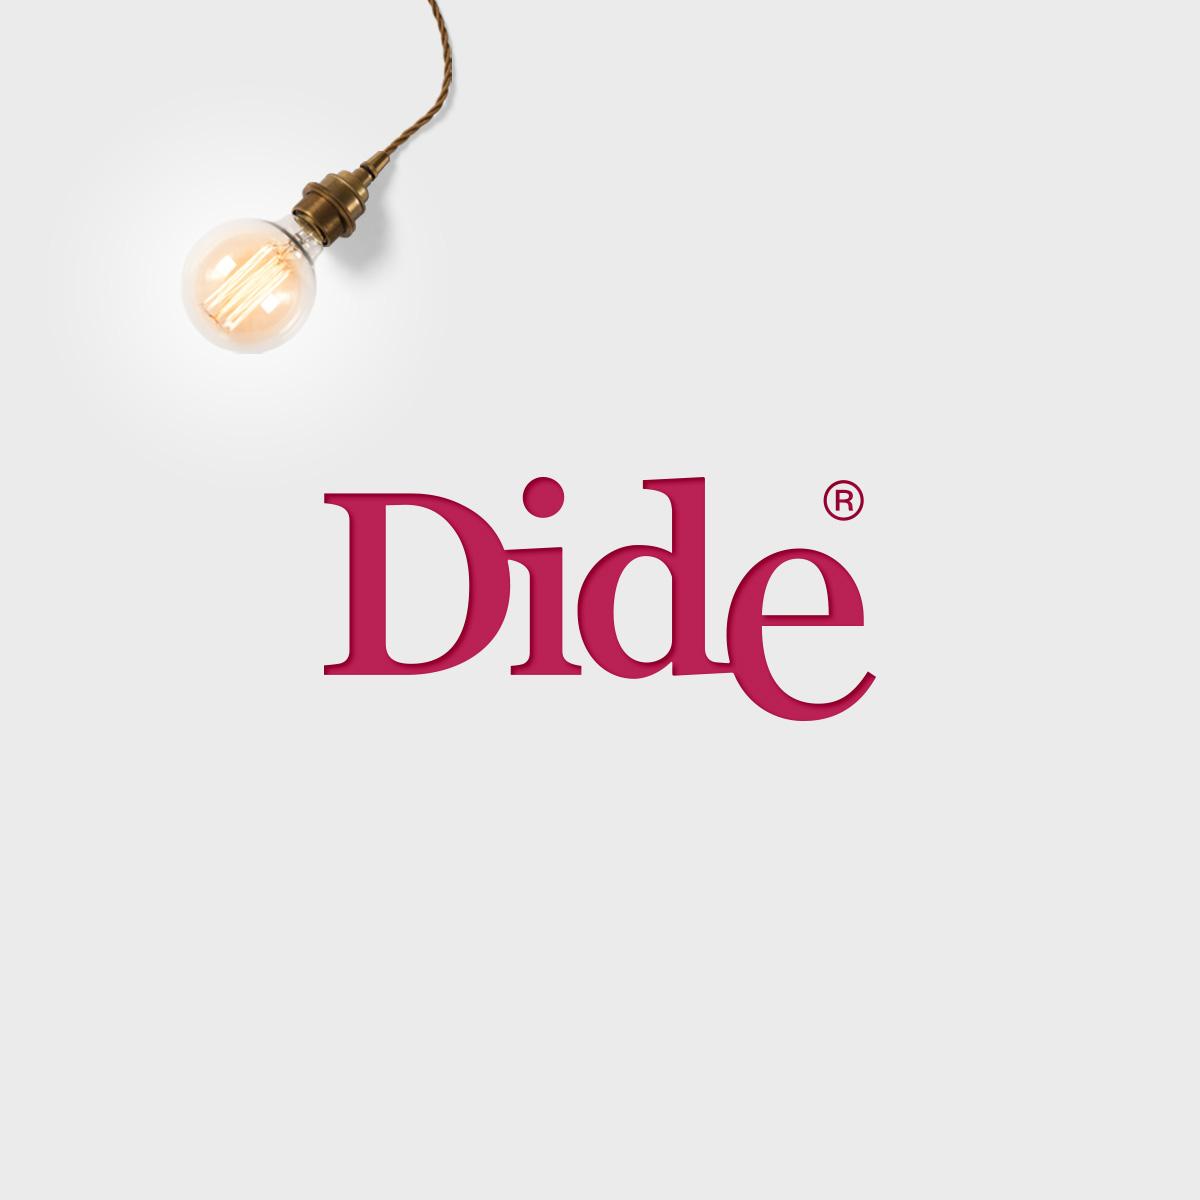 Dide. Logo for an interior design store